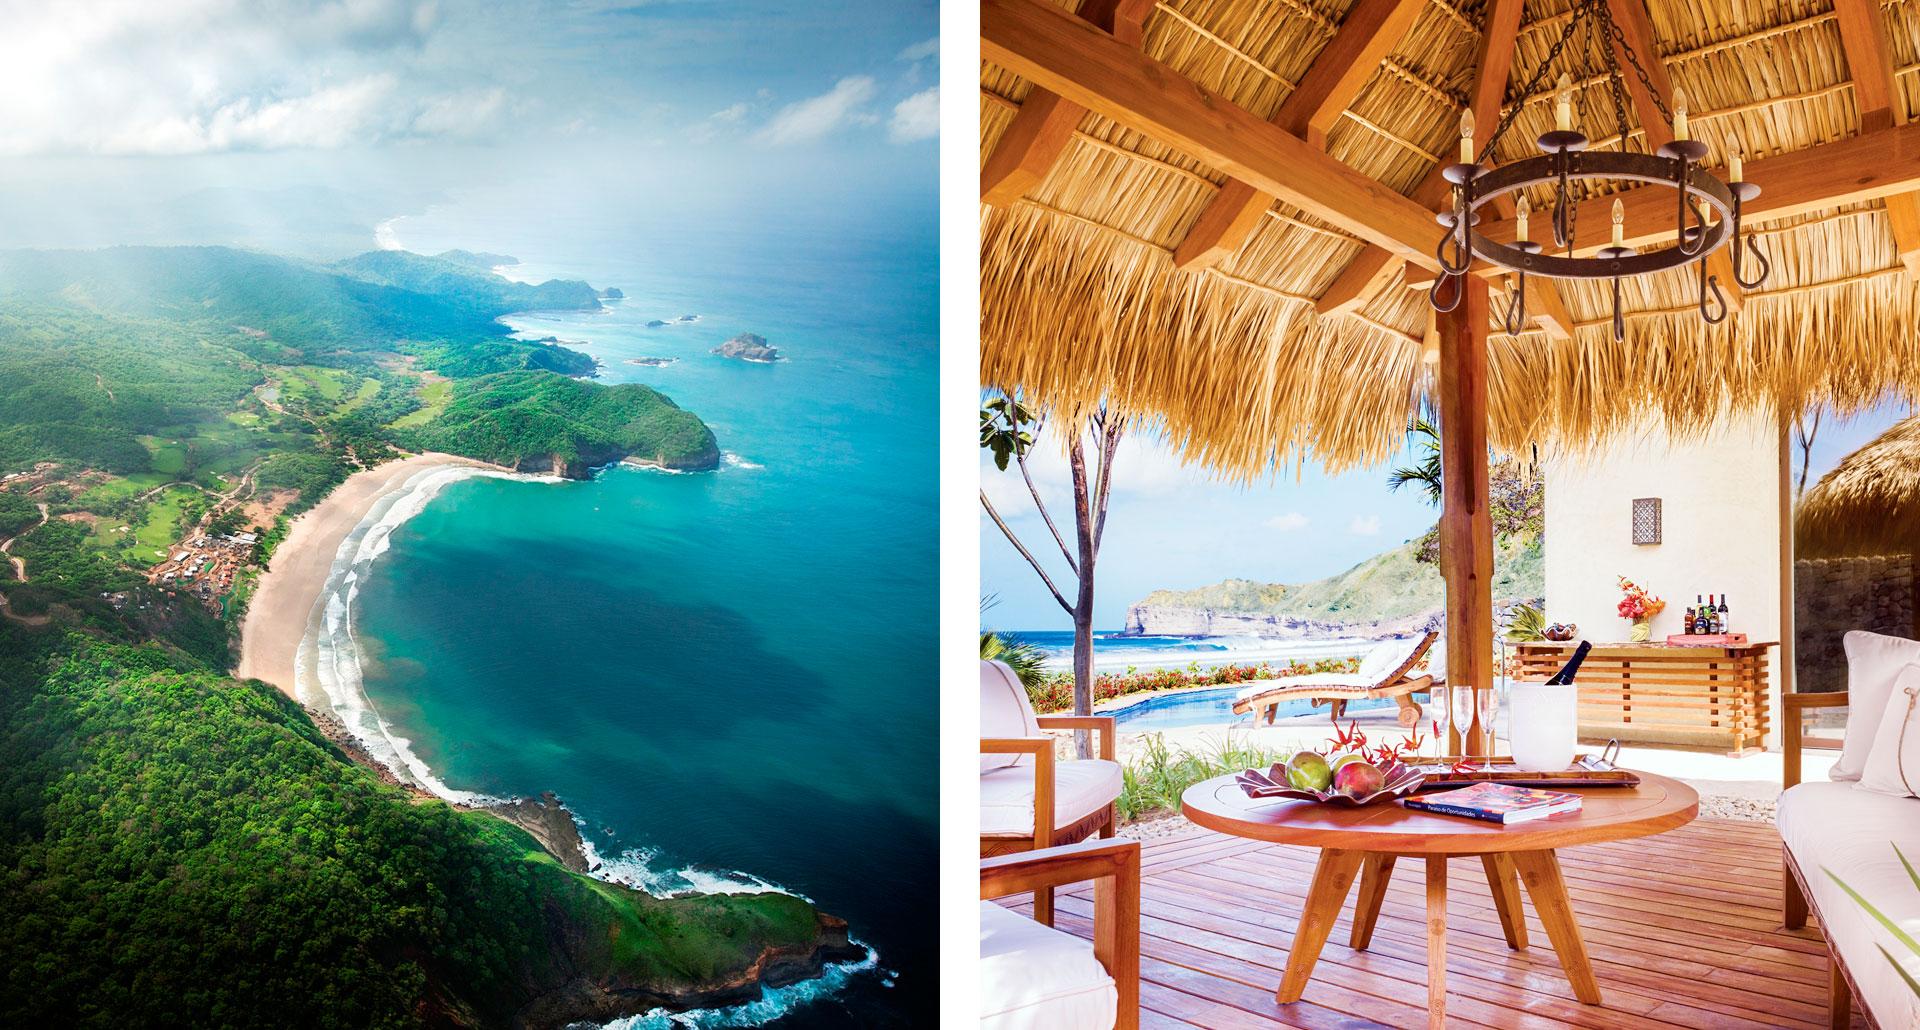 Mukul Resort & Spa - boutique hotel in Rivas